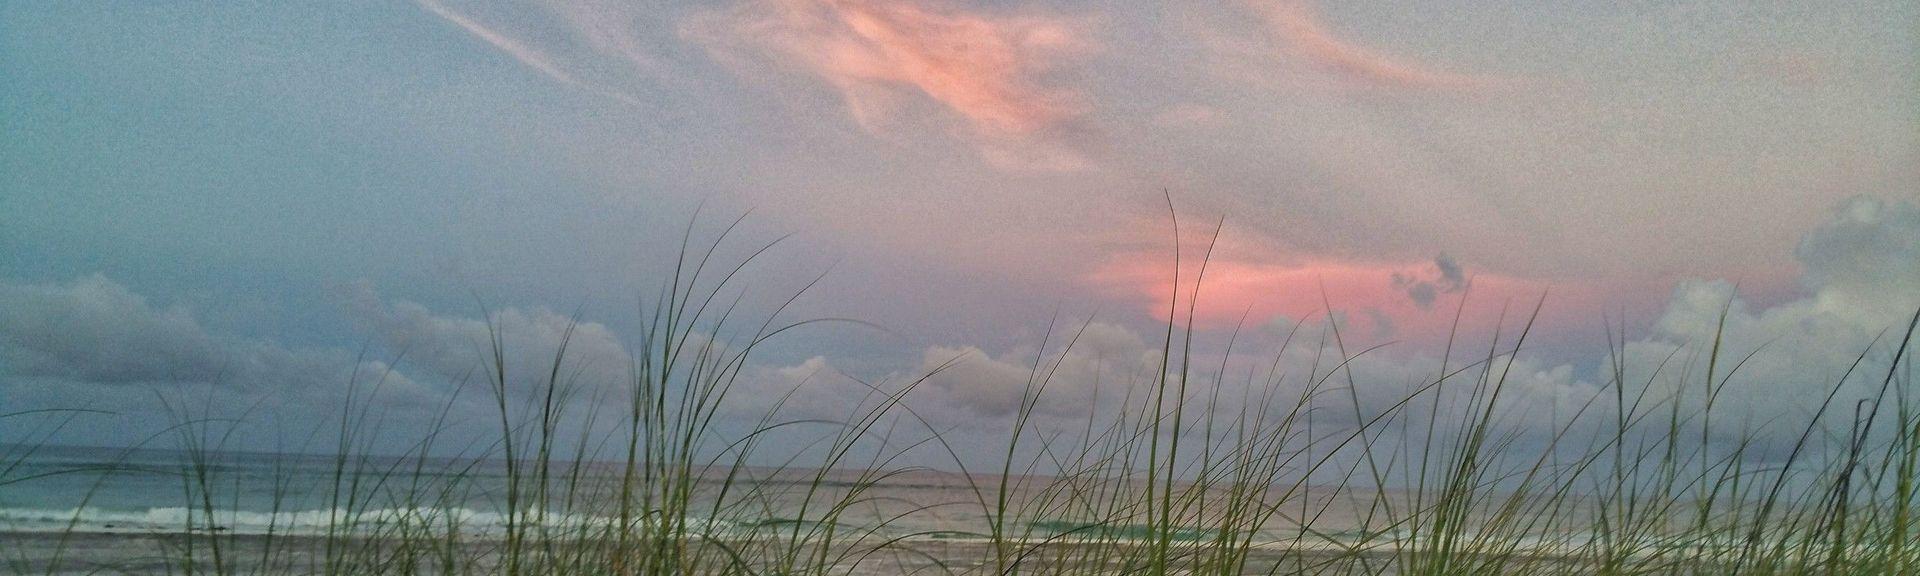 Grayton Beach State Park, Santa Rosa Beach, Florida, United States of America